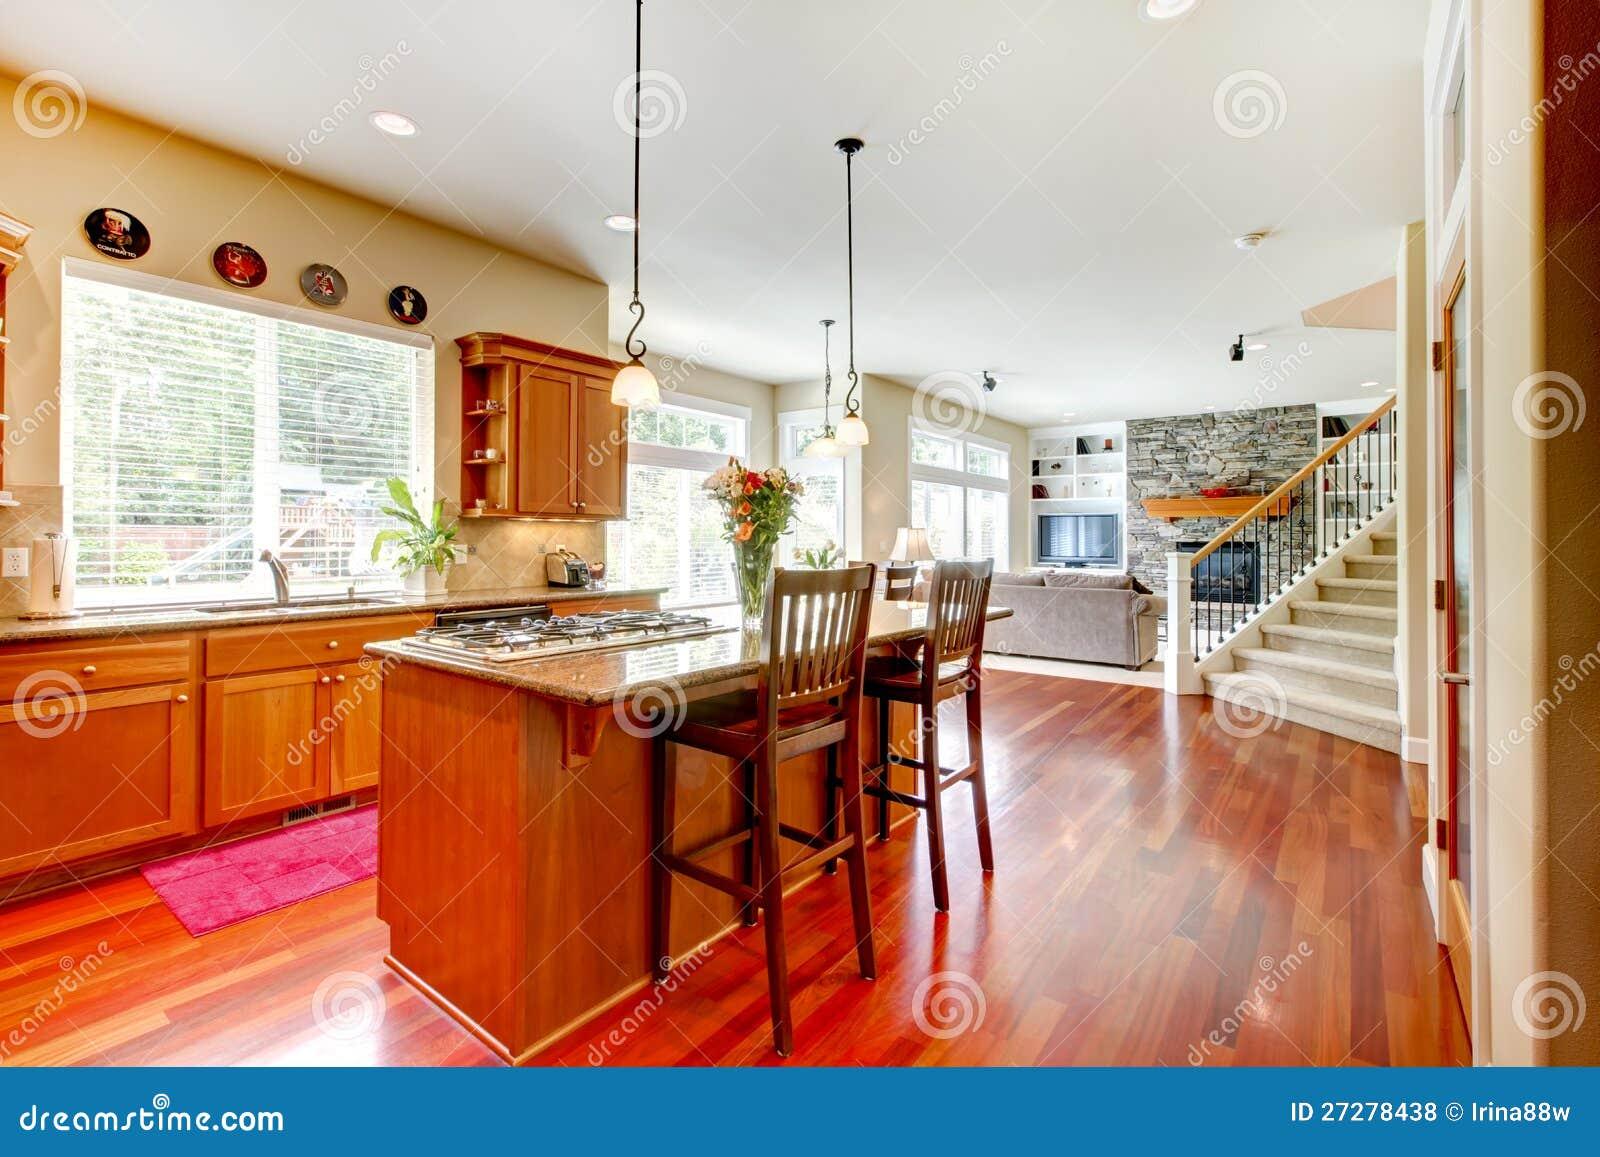 Wood Lyxigt Stort Kök, Vardagsrum Arkivfoto - Bild: 27278438